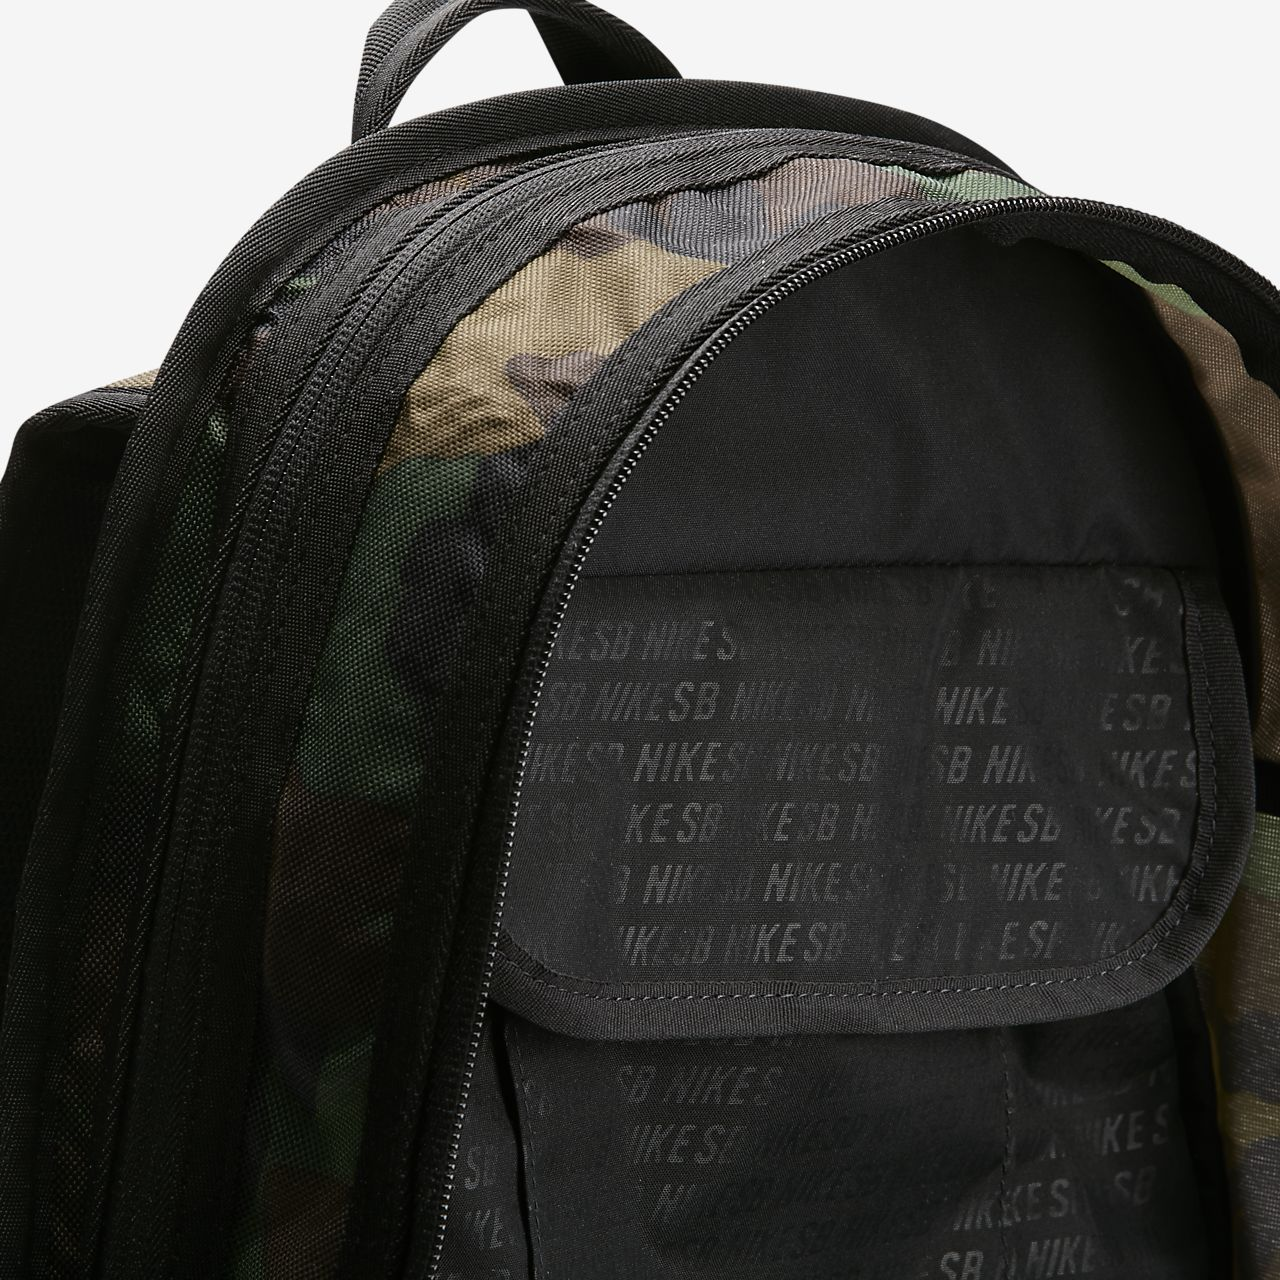 eb47dcefa Nike SB RPM Graphic Skateboarding Backpack. Nike.com CA